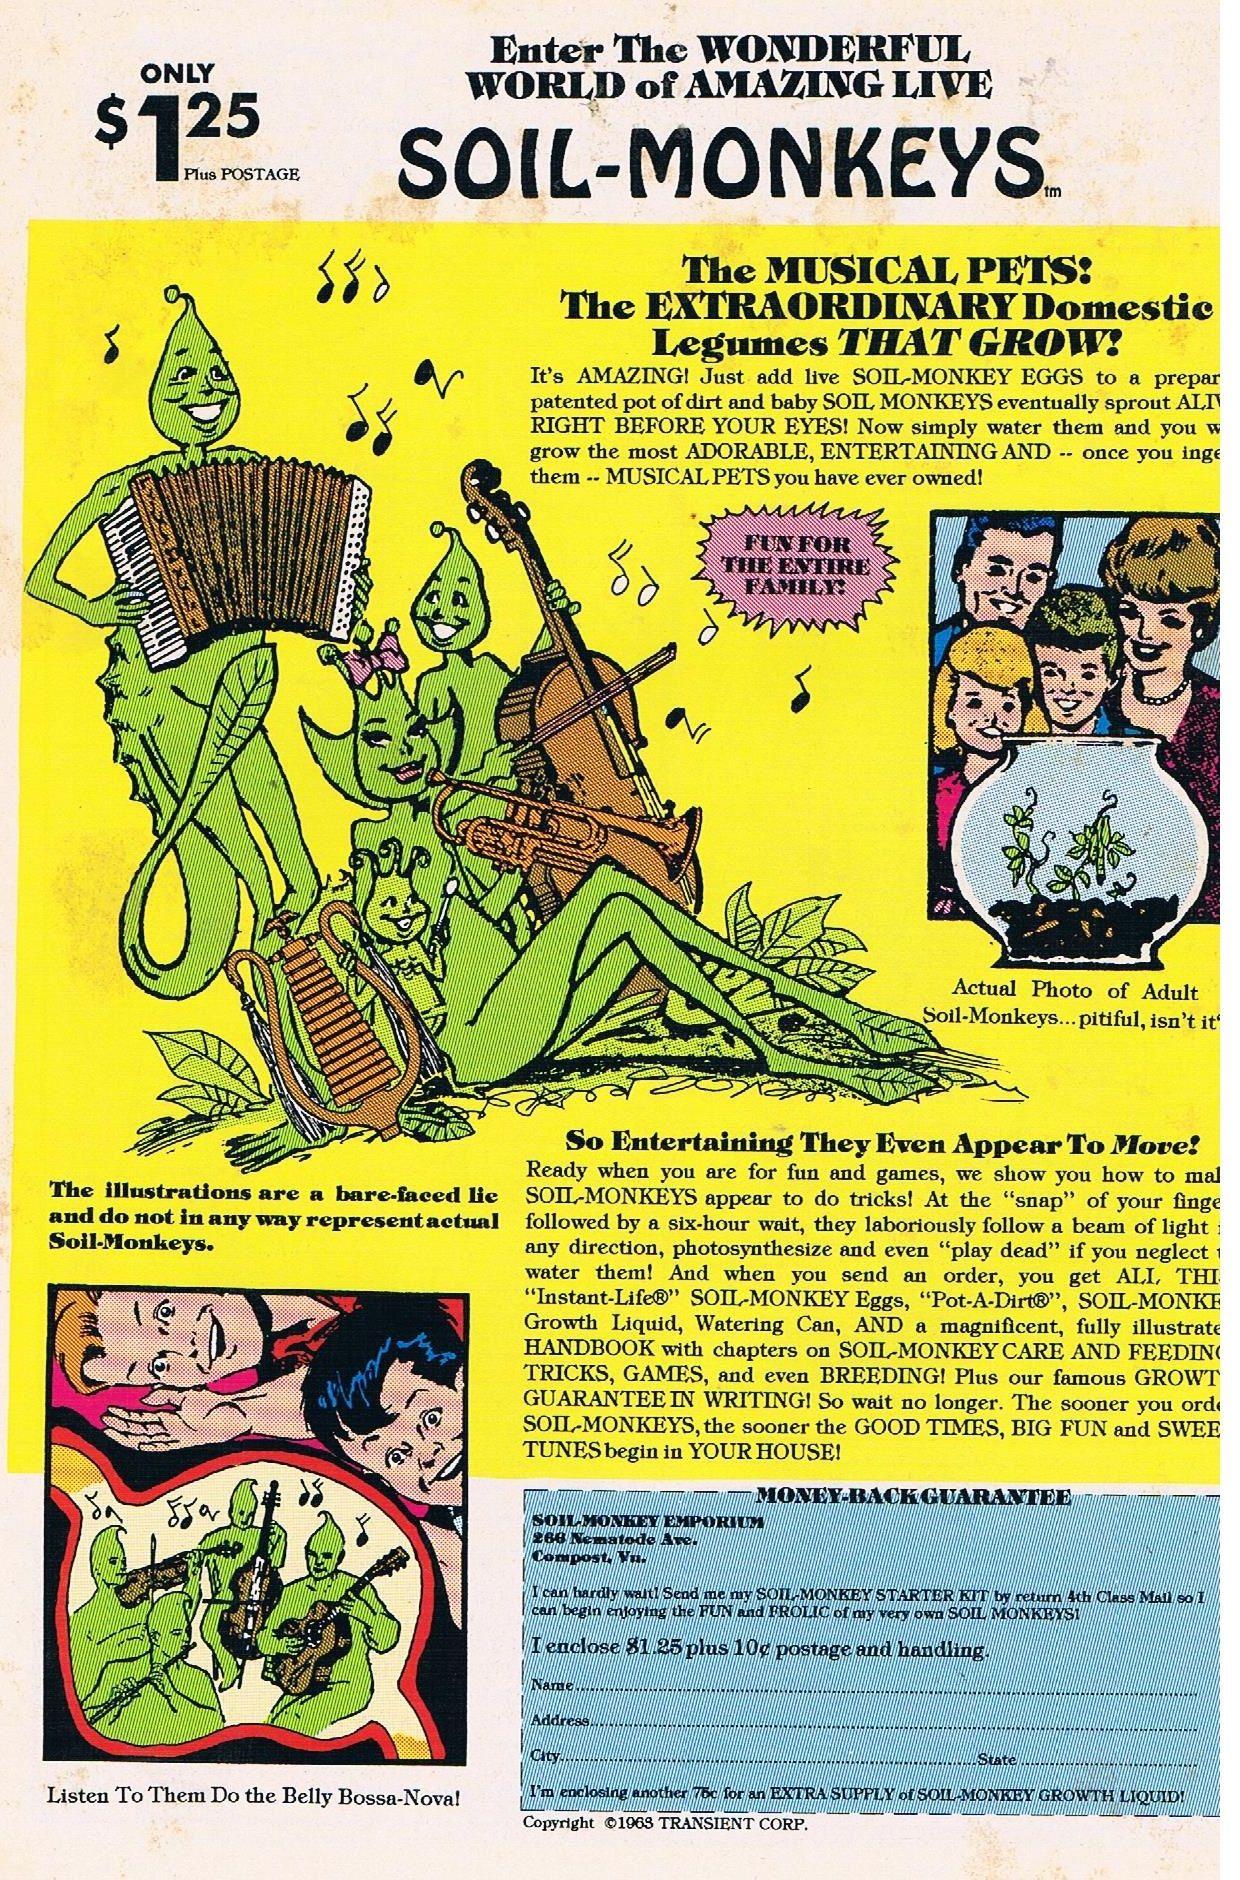 Soil Monkeys 1993 Image Comics Parody Advert From Nostalgic Series 1963 レトロ